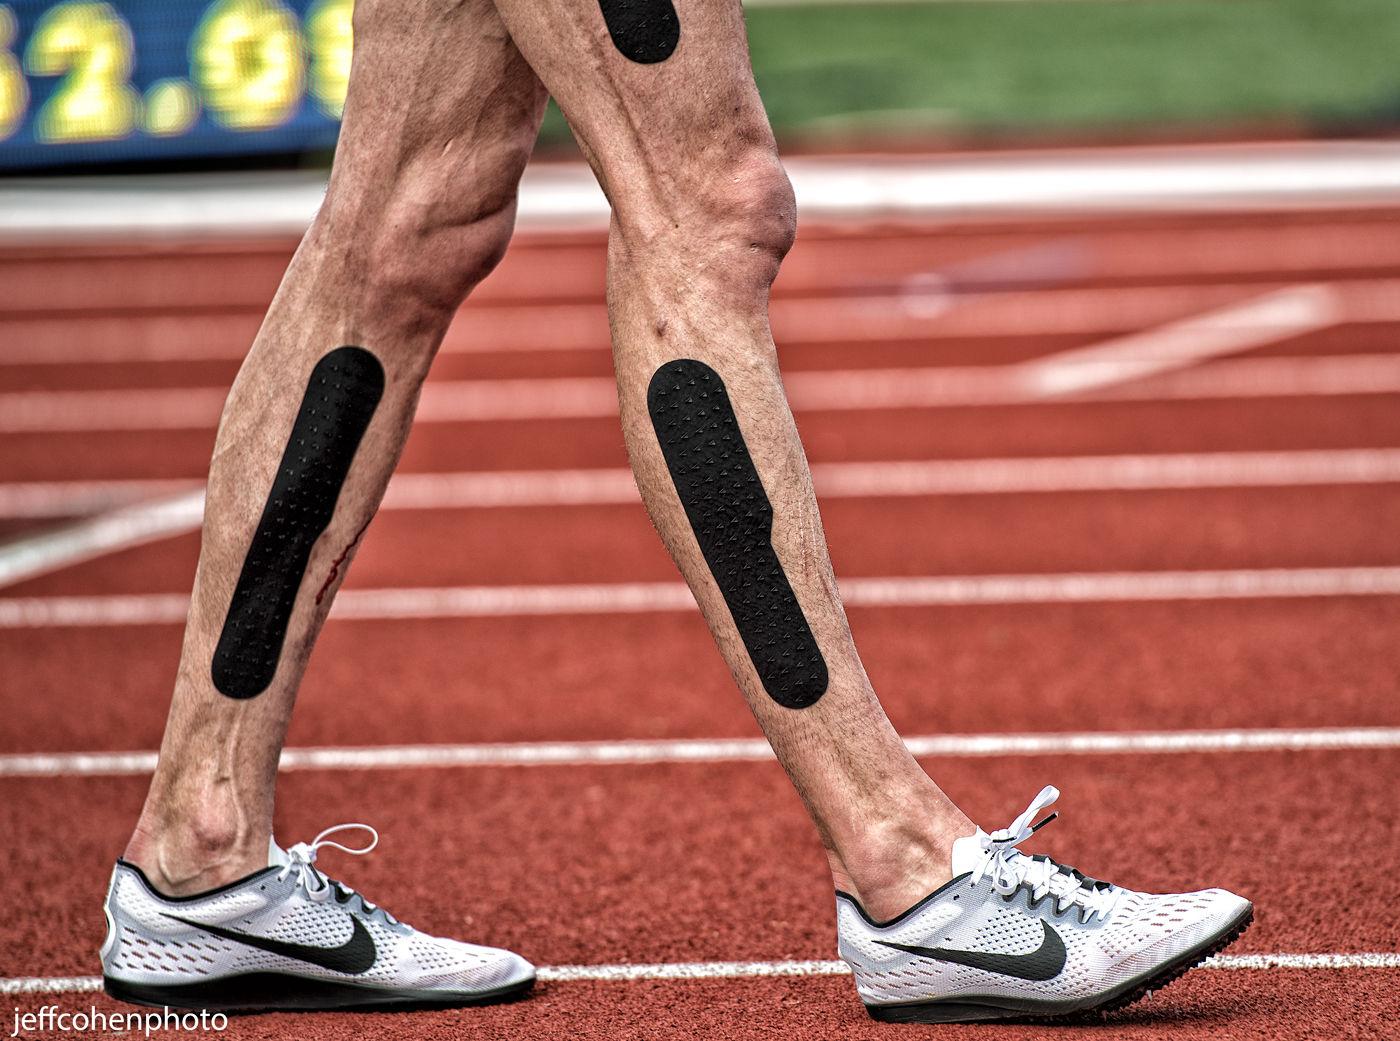 1r2016_oly_trials_day_8_rupp_legs_jeff_cohen_photo_26407_web.jpg